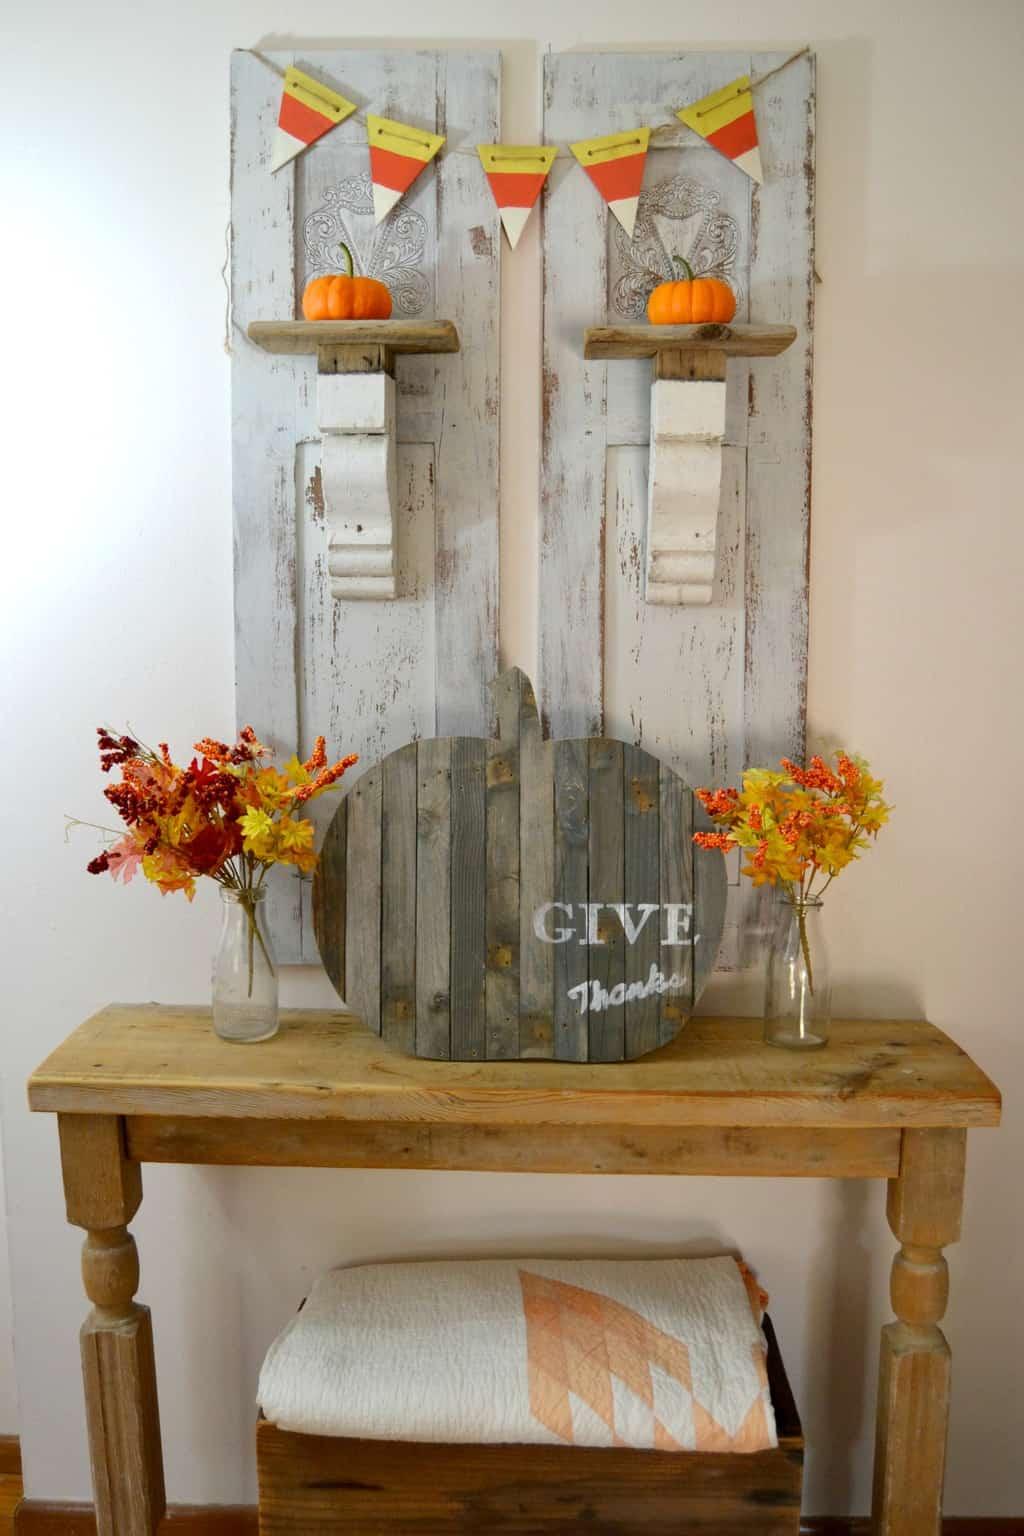 Repurposed Repurposed Give Thanks Pumpkin My Creative Days